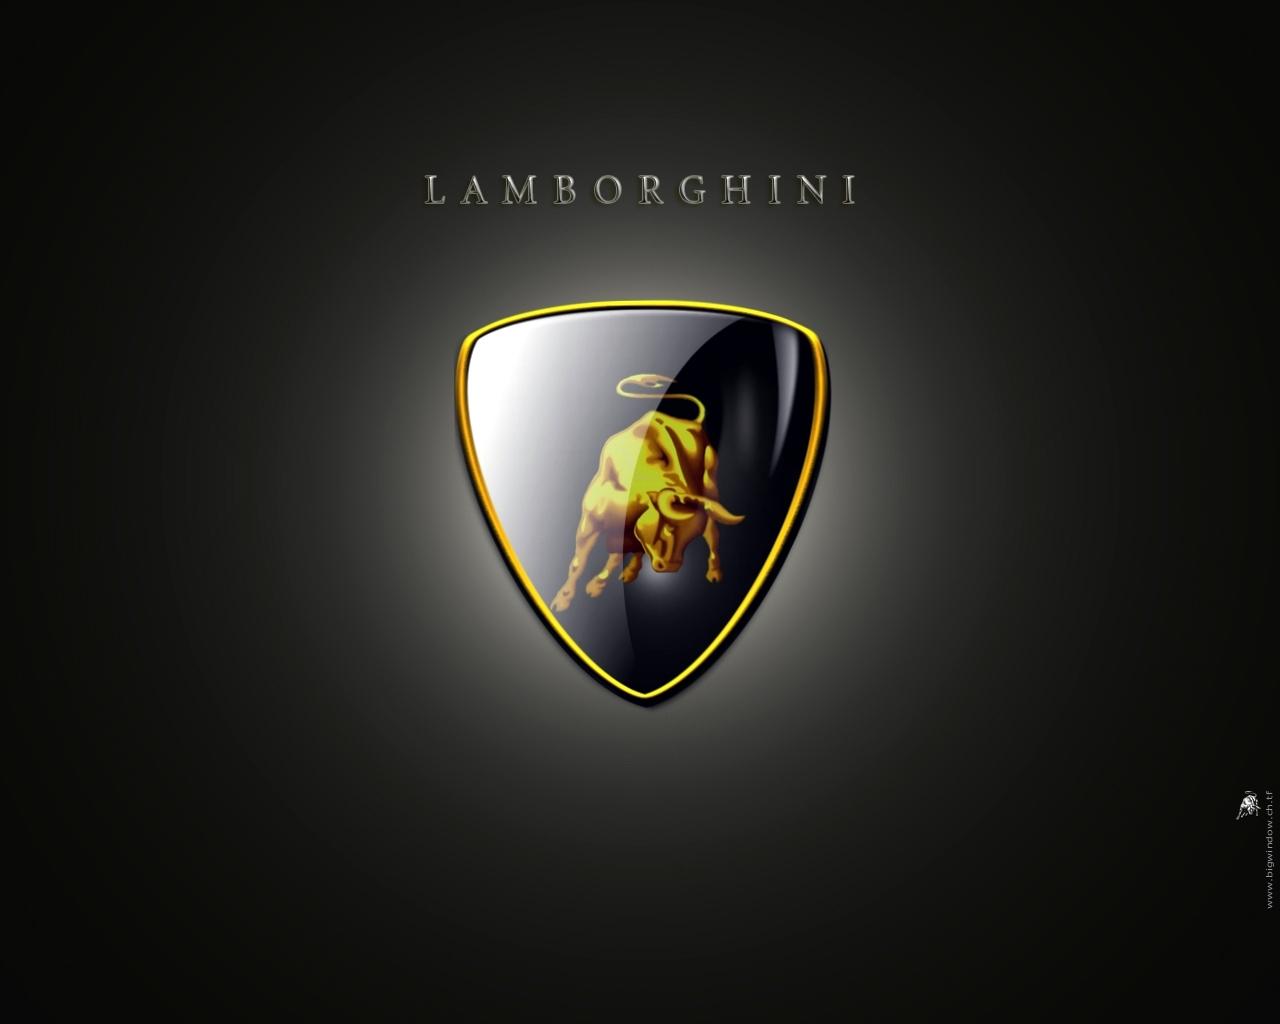 Lamborghini wallpaper 29